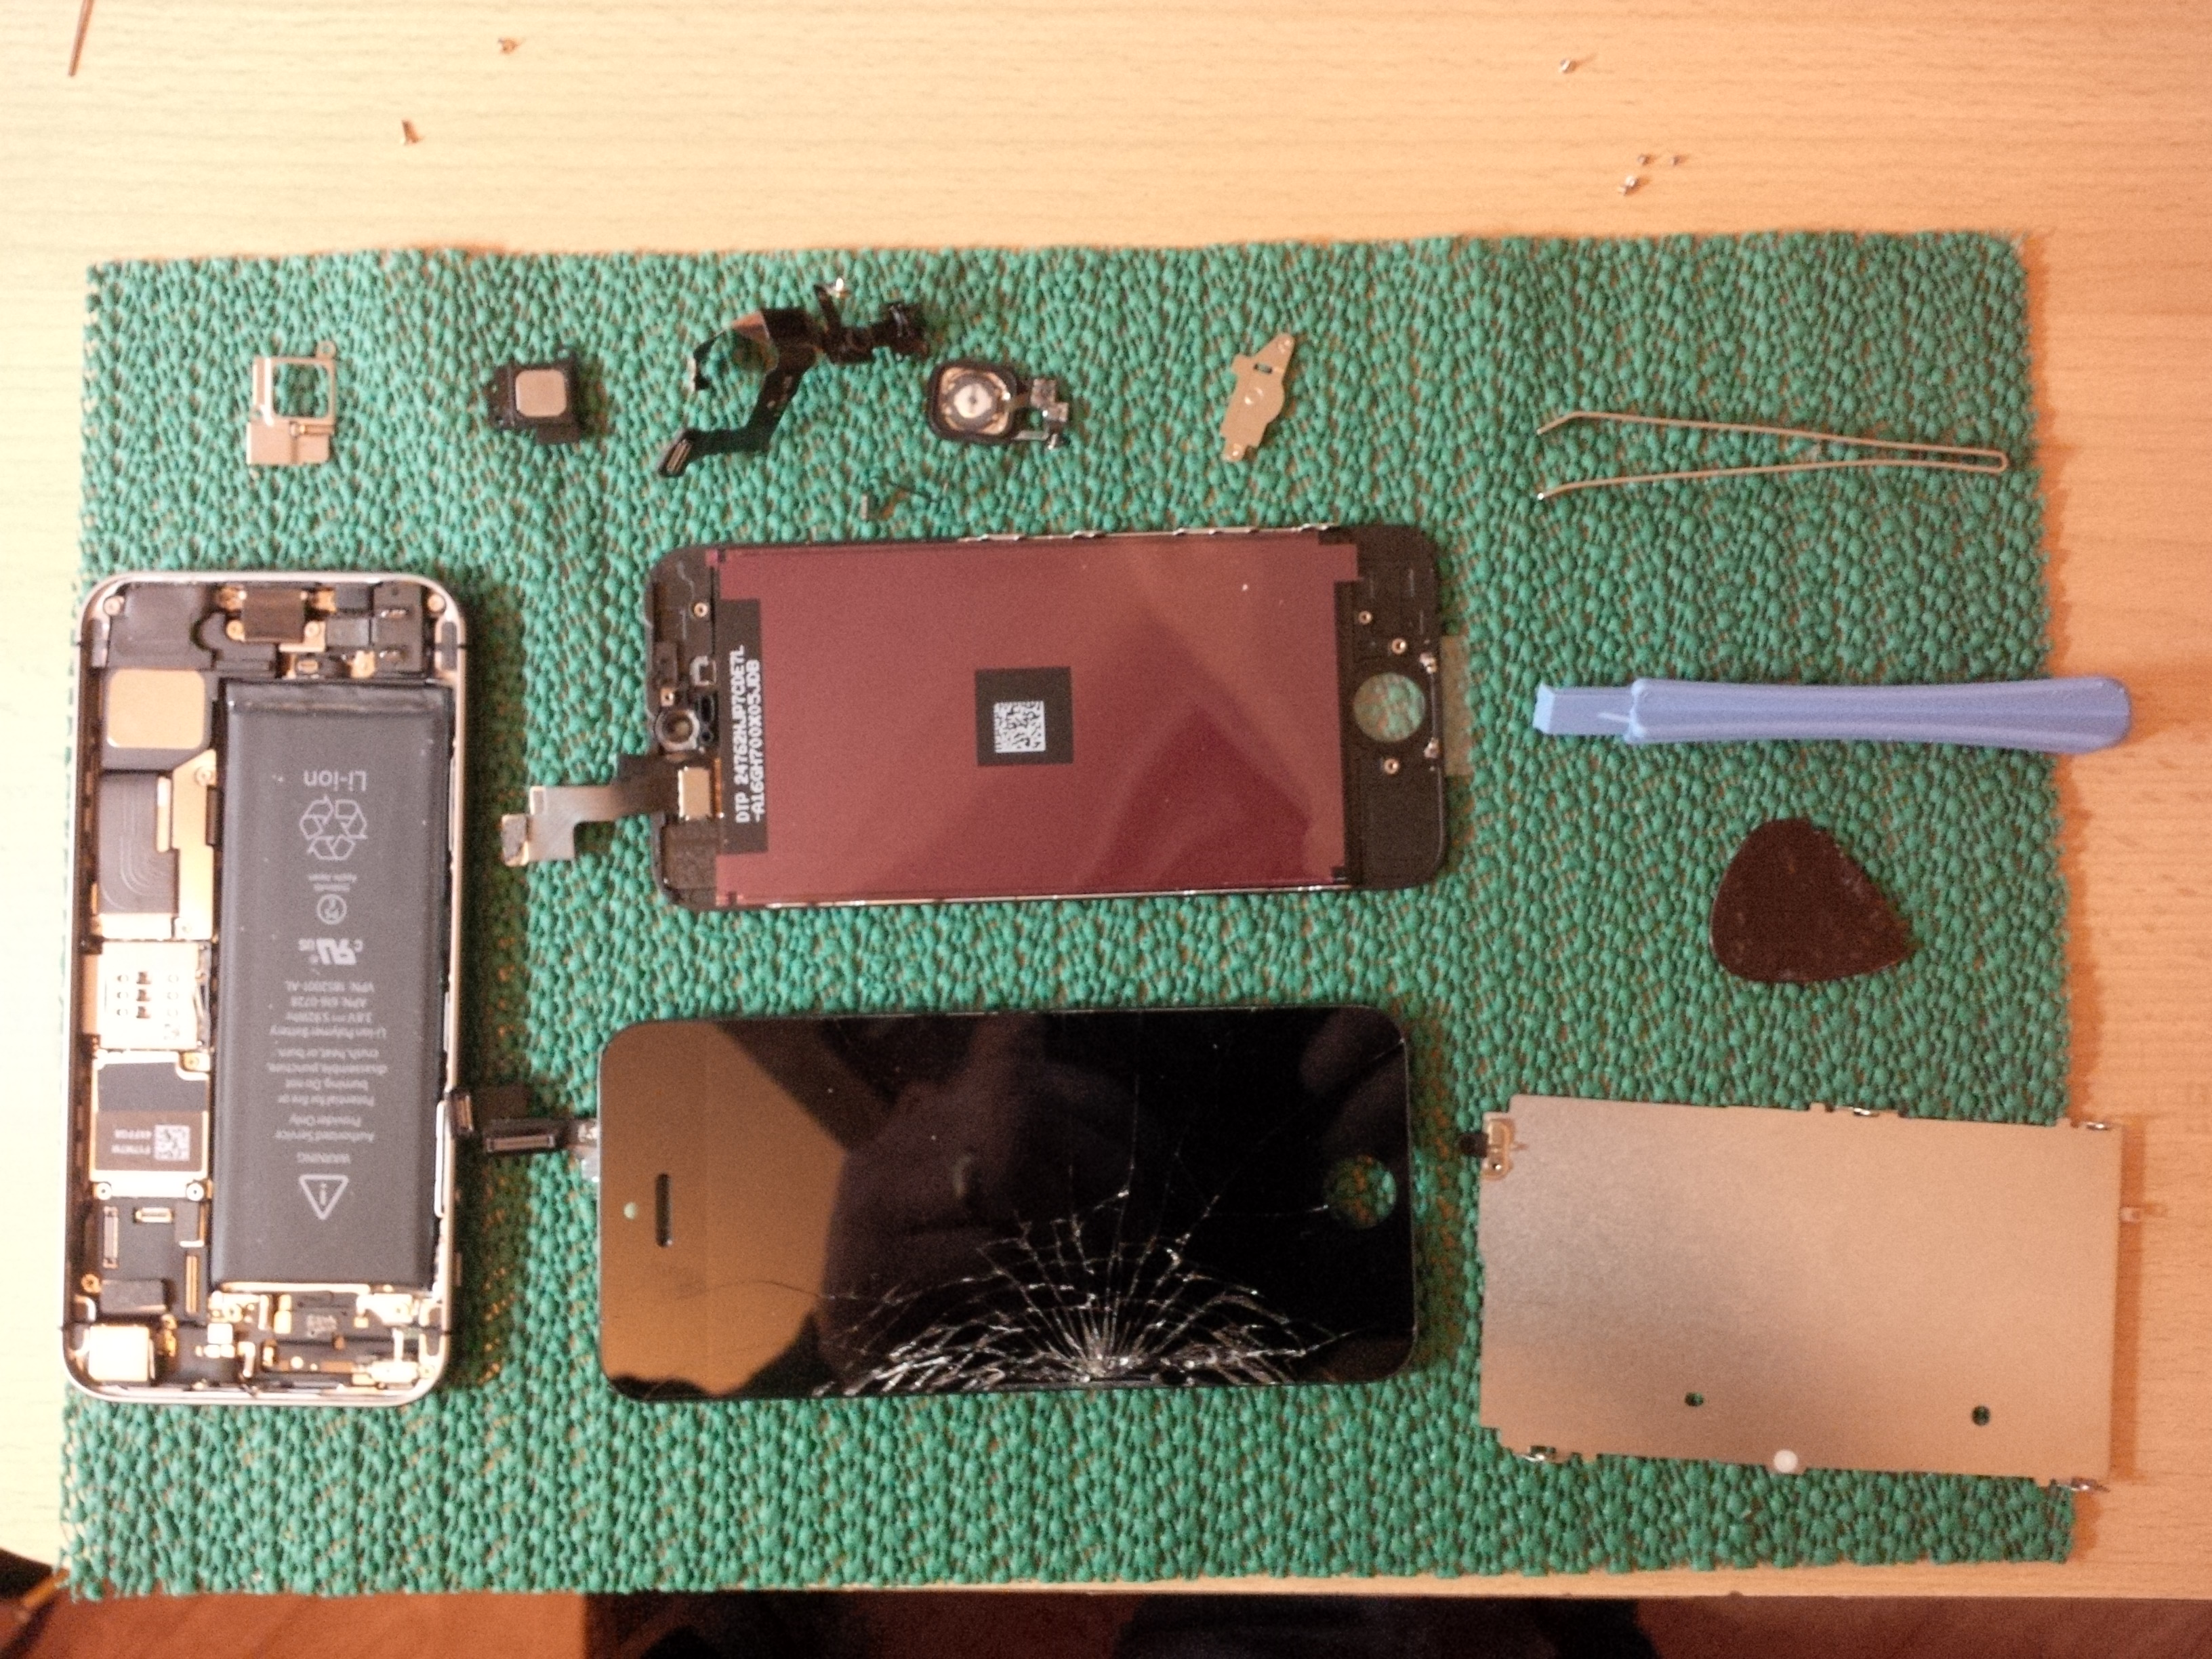 iPhone5 Stripped For Repair